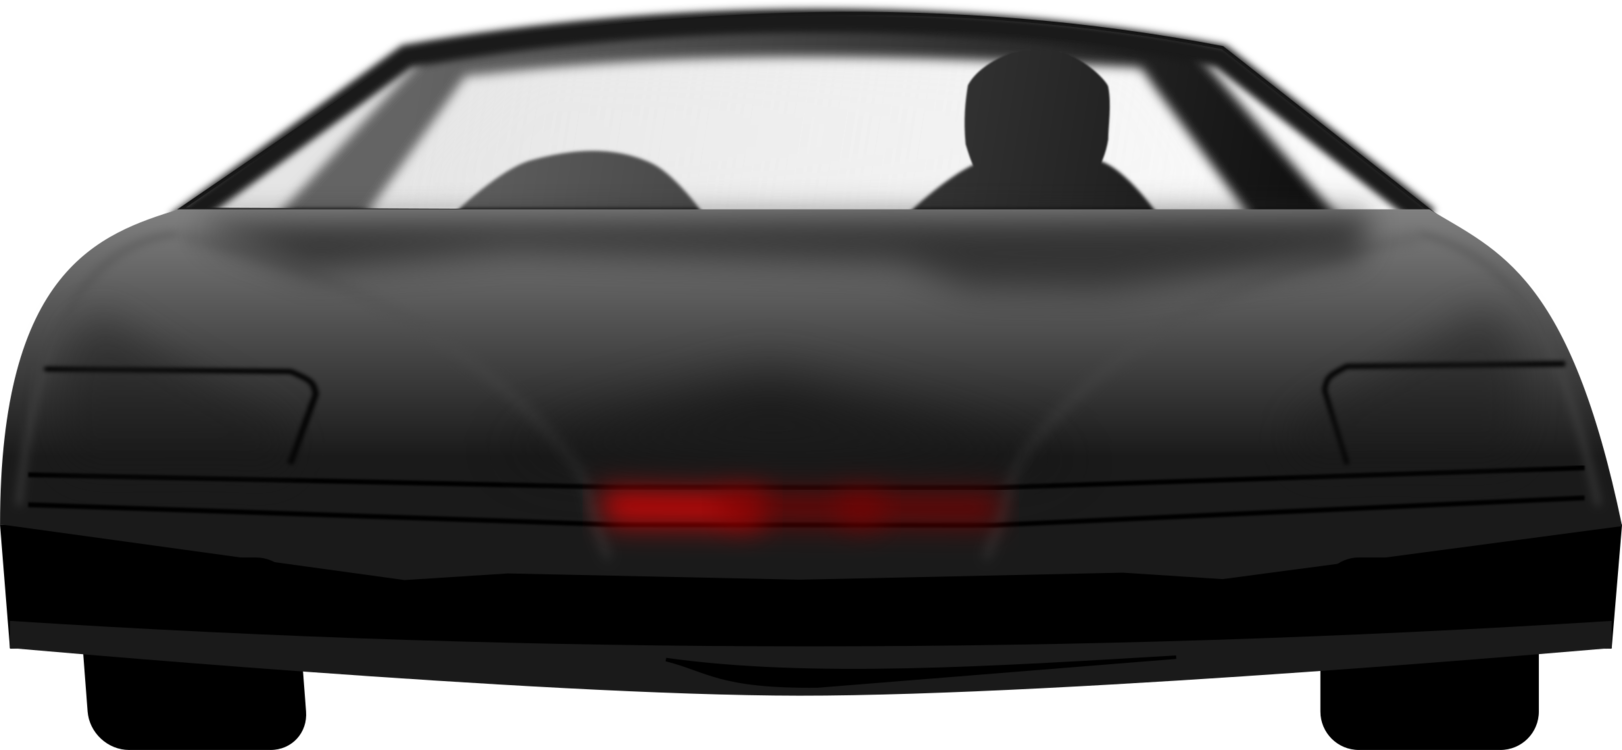 K I T T  Sports car KARR Knight Rider CC0 - Family Car,Automotive